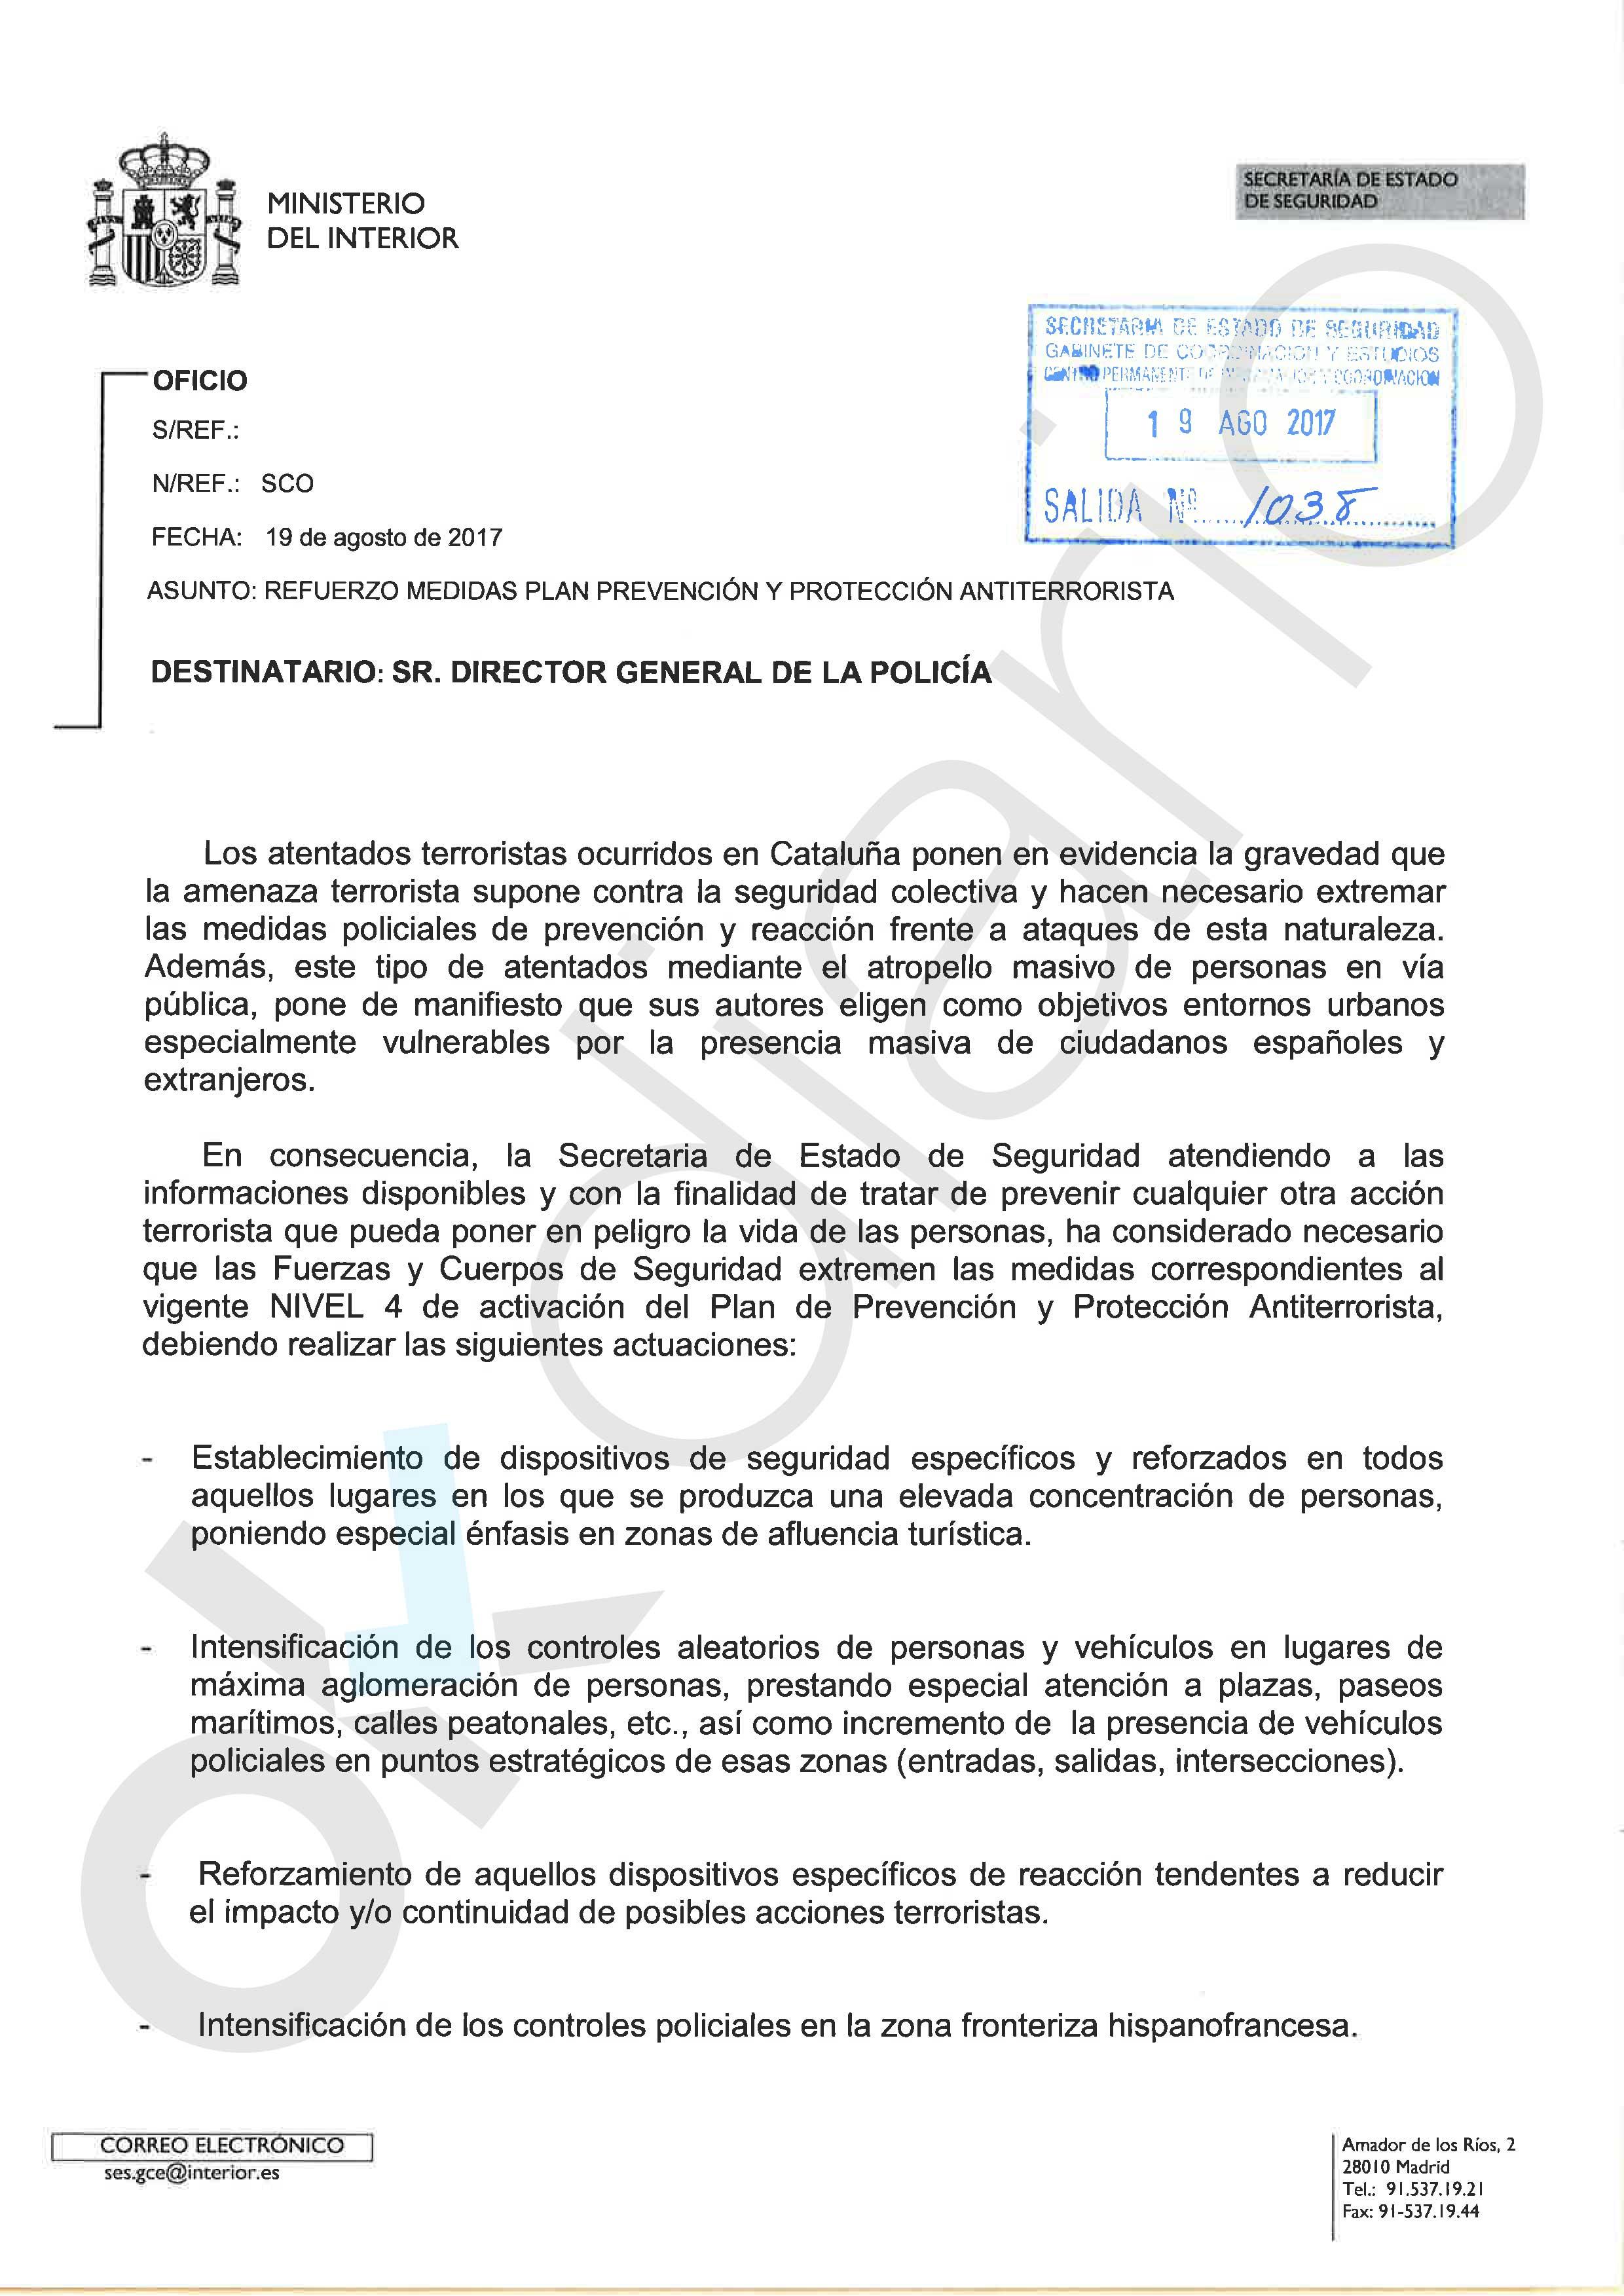 Carta de instrucciones de interior a la polic a m s for Notificacion ministerio del interior